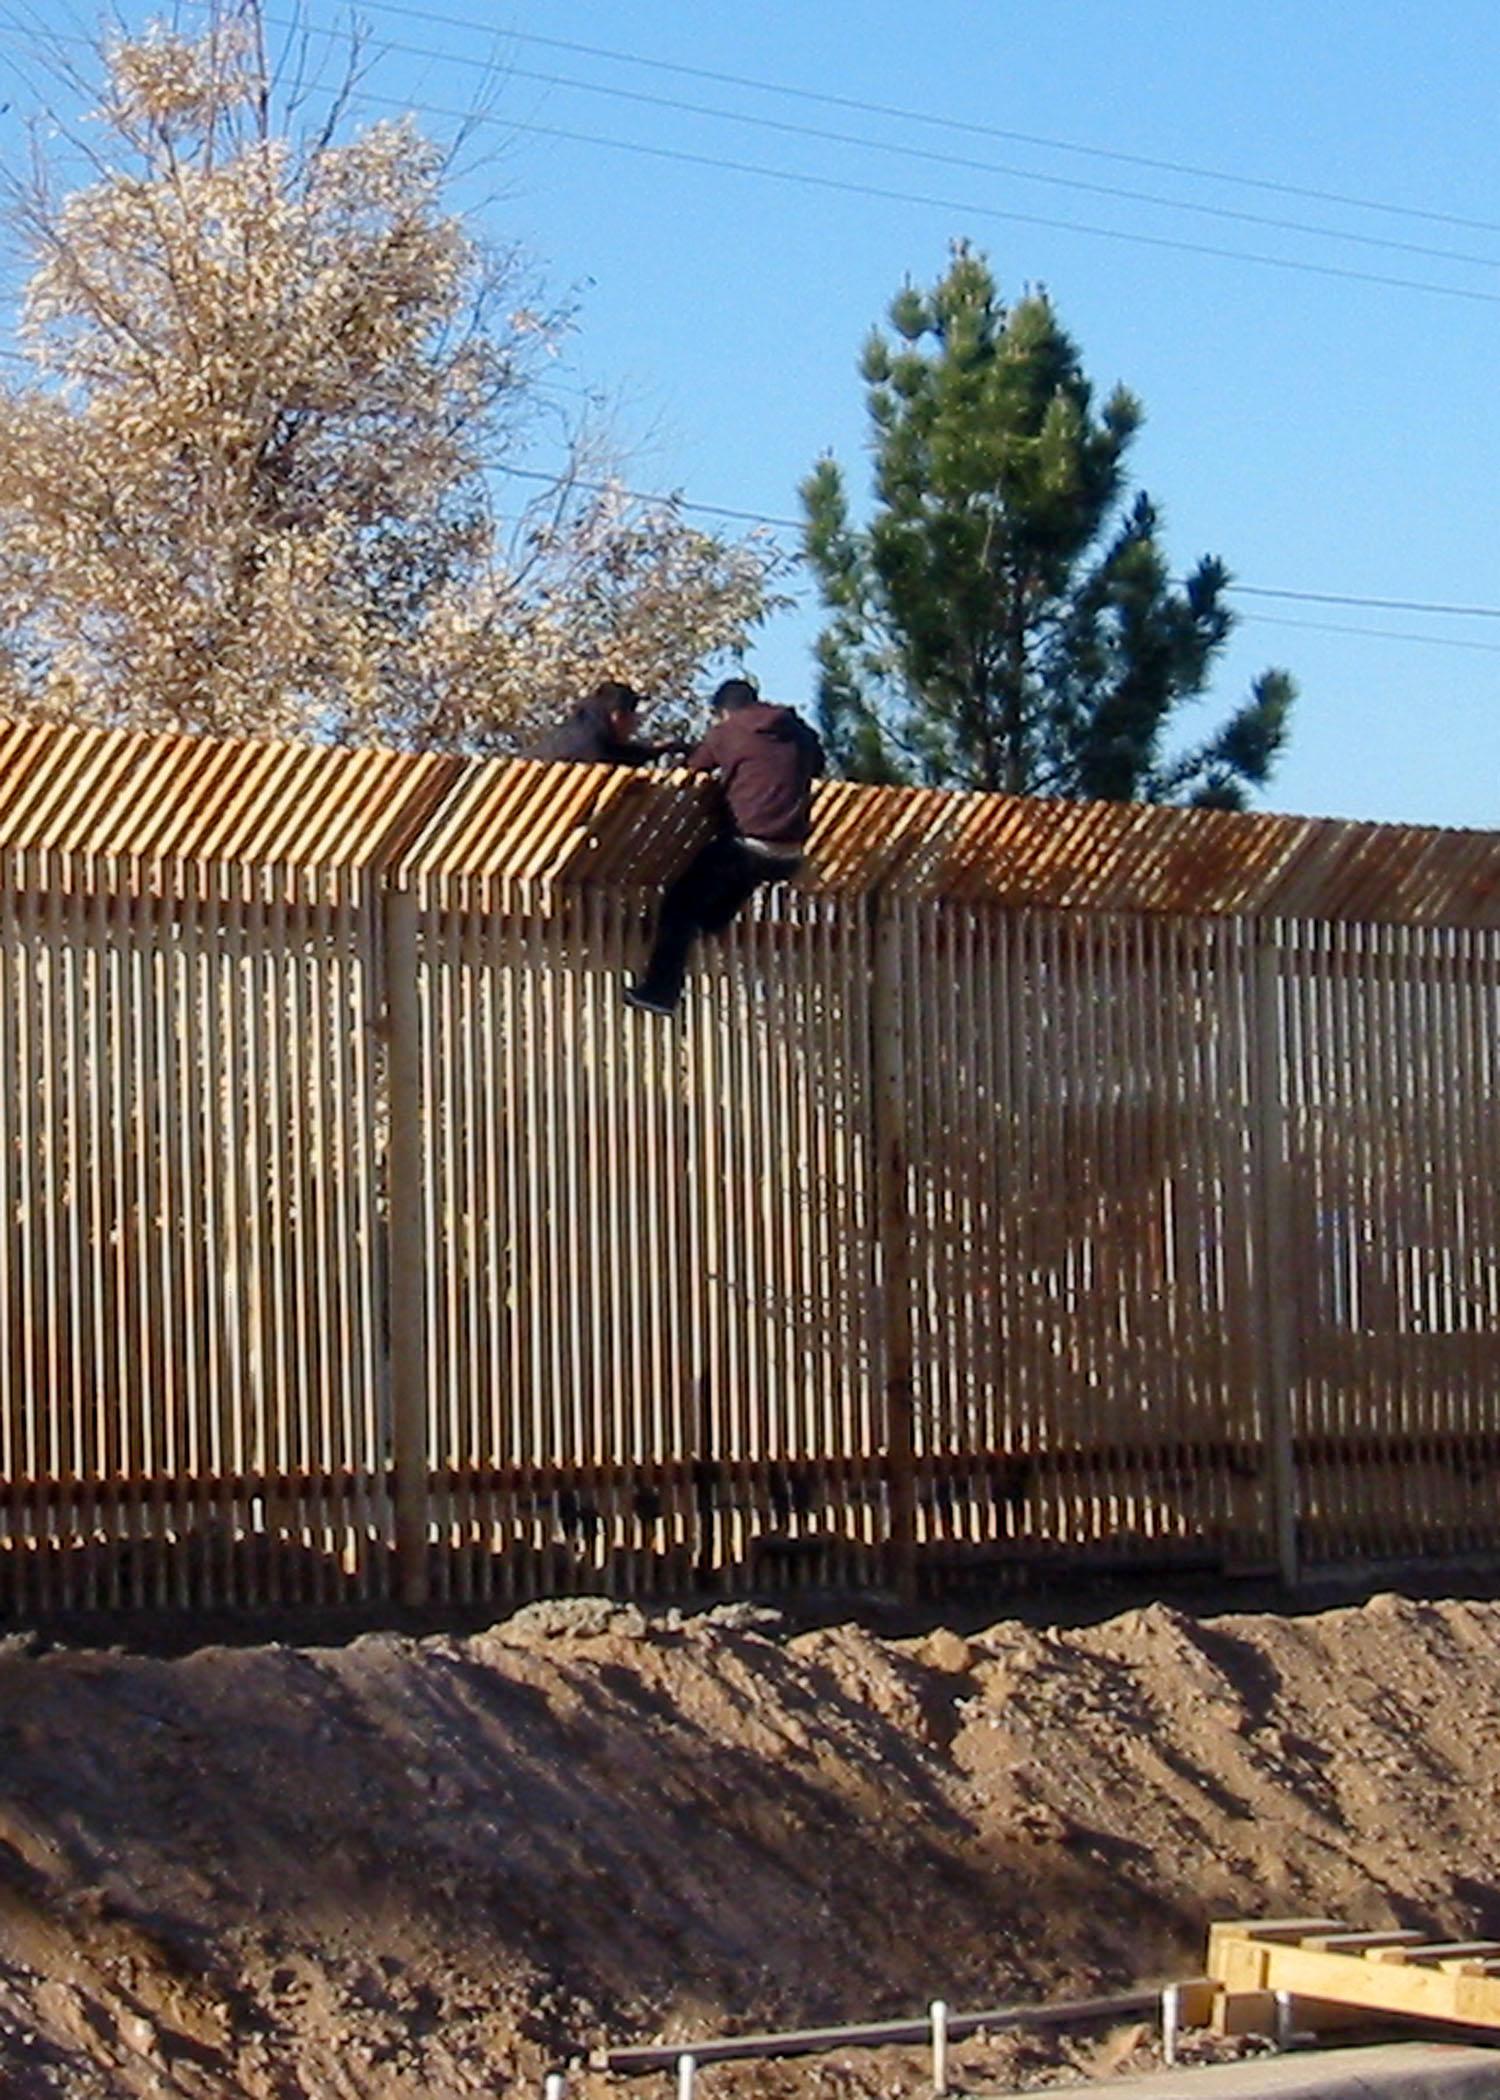 Build a Border Wall? Food for Thought | ImmigrationReform com